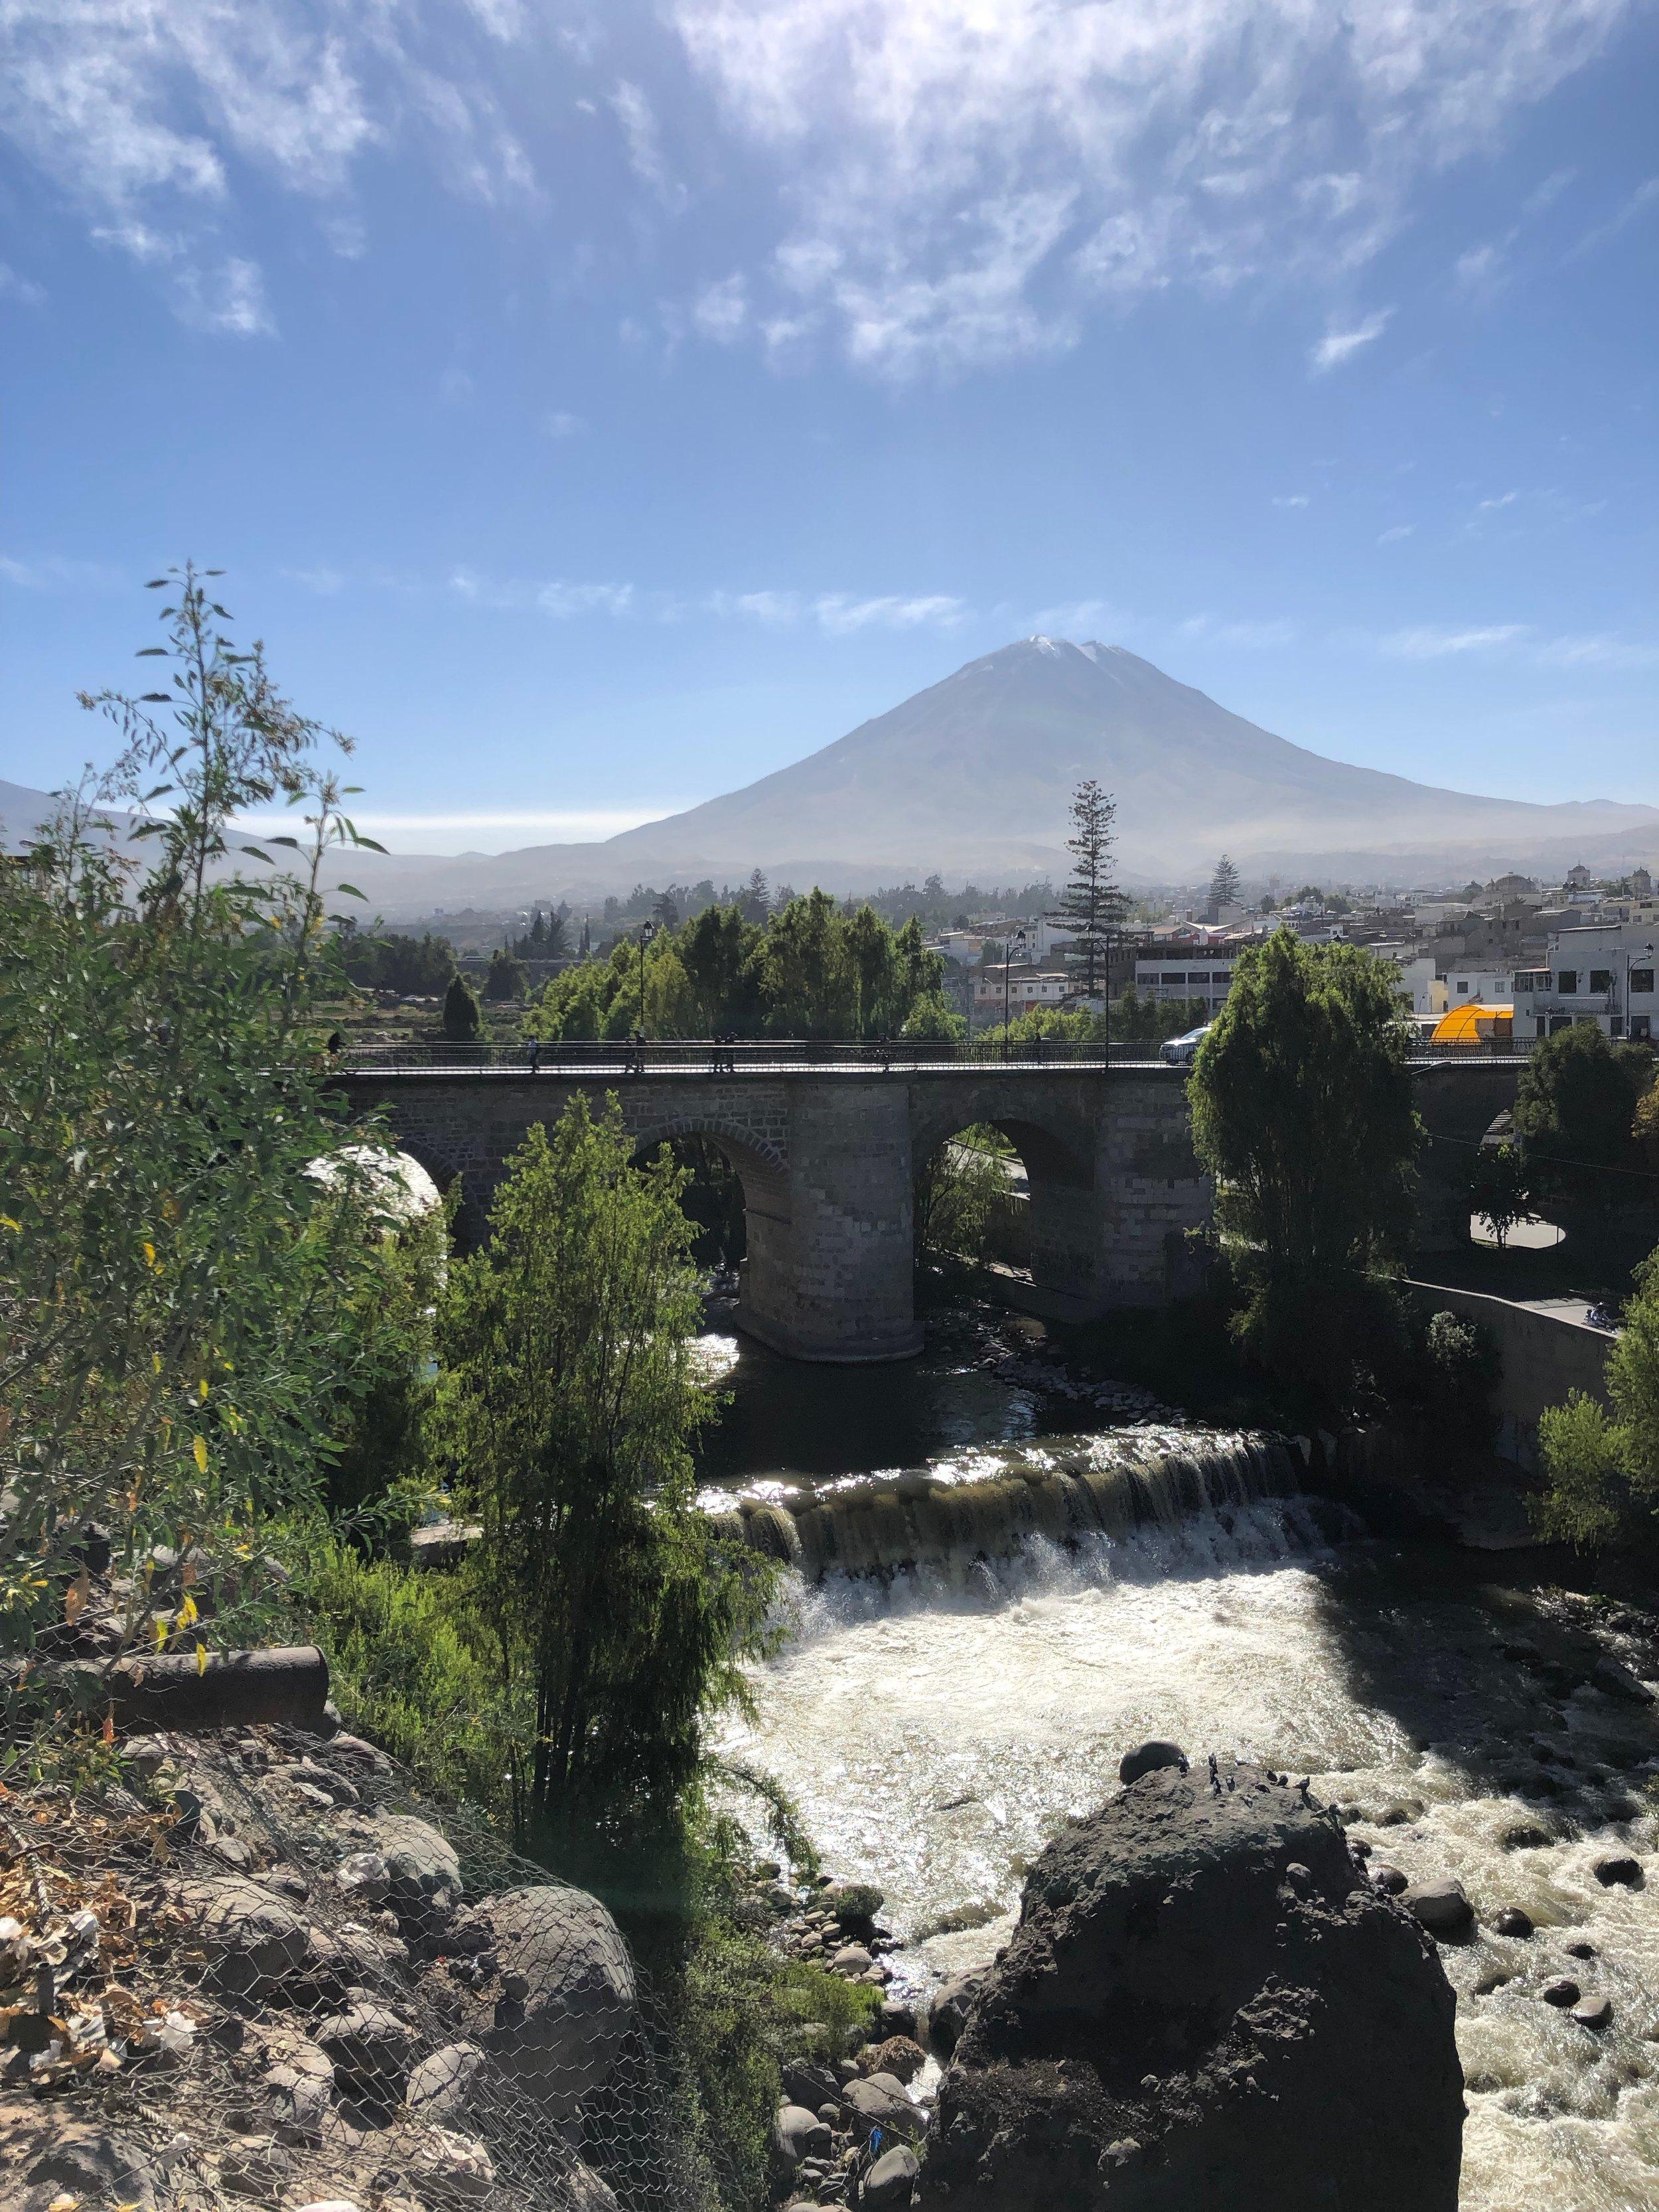 View on the way to Yanahuara